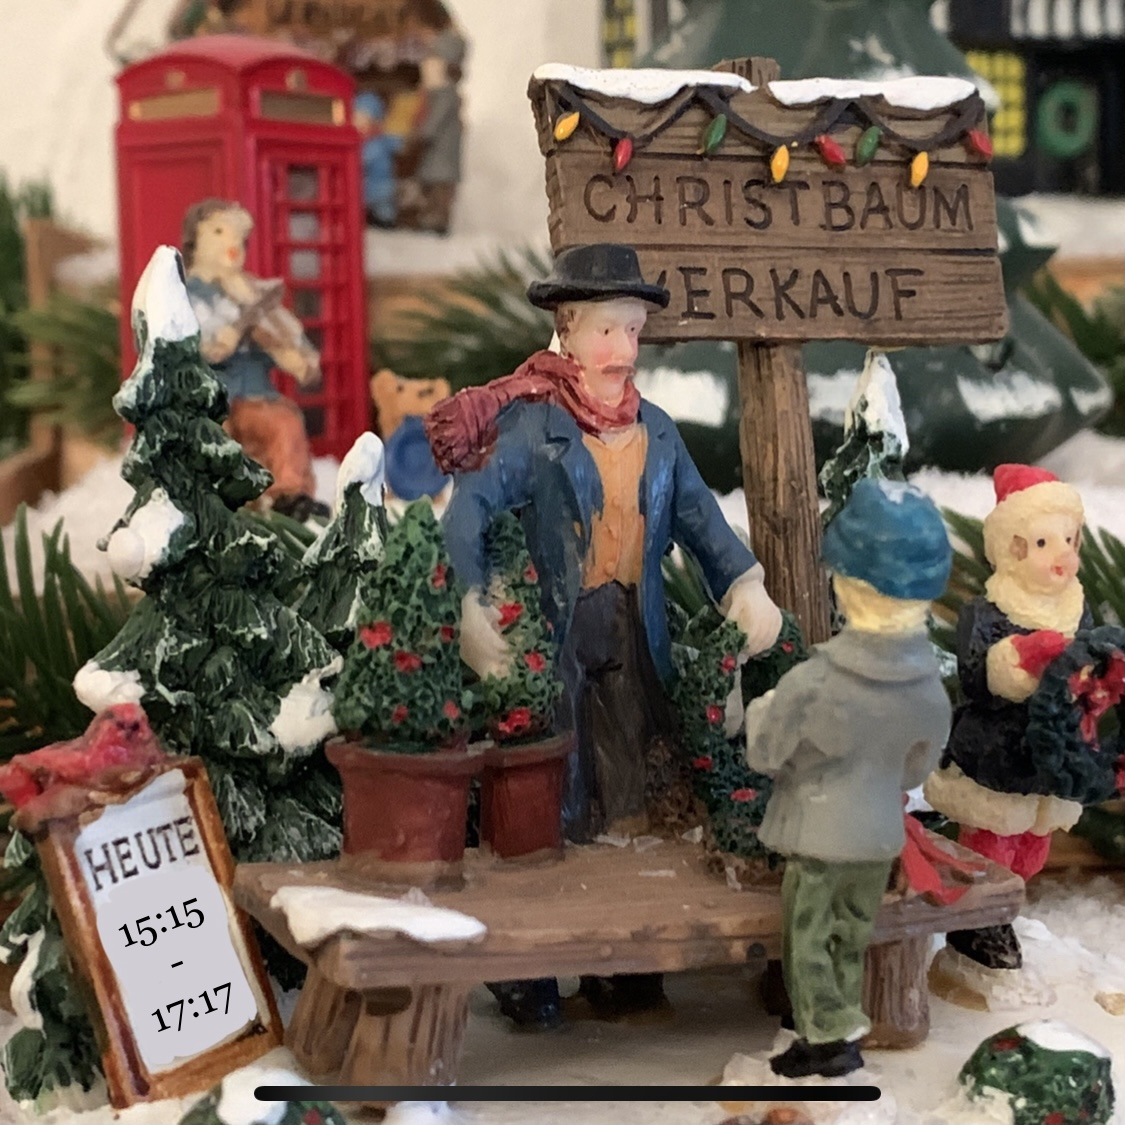 Baumverkauf 14. Dezember 🎄